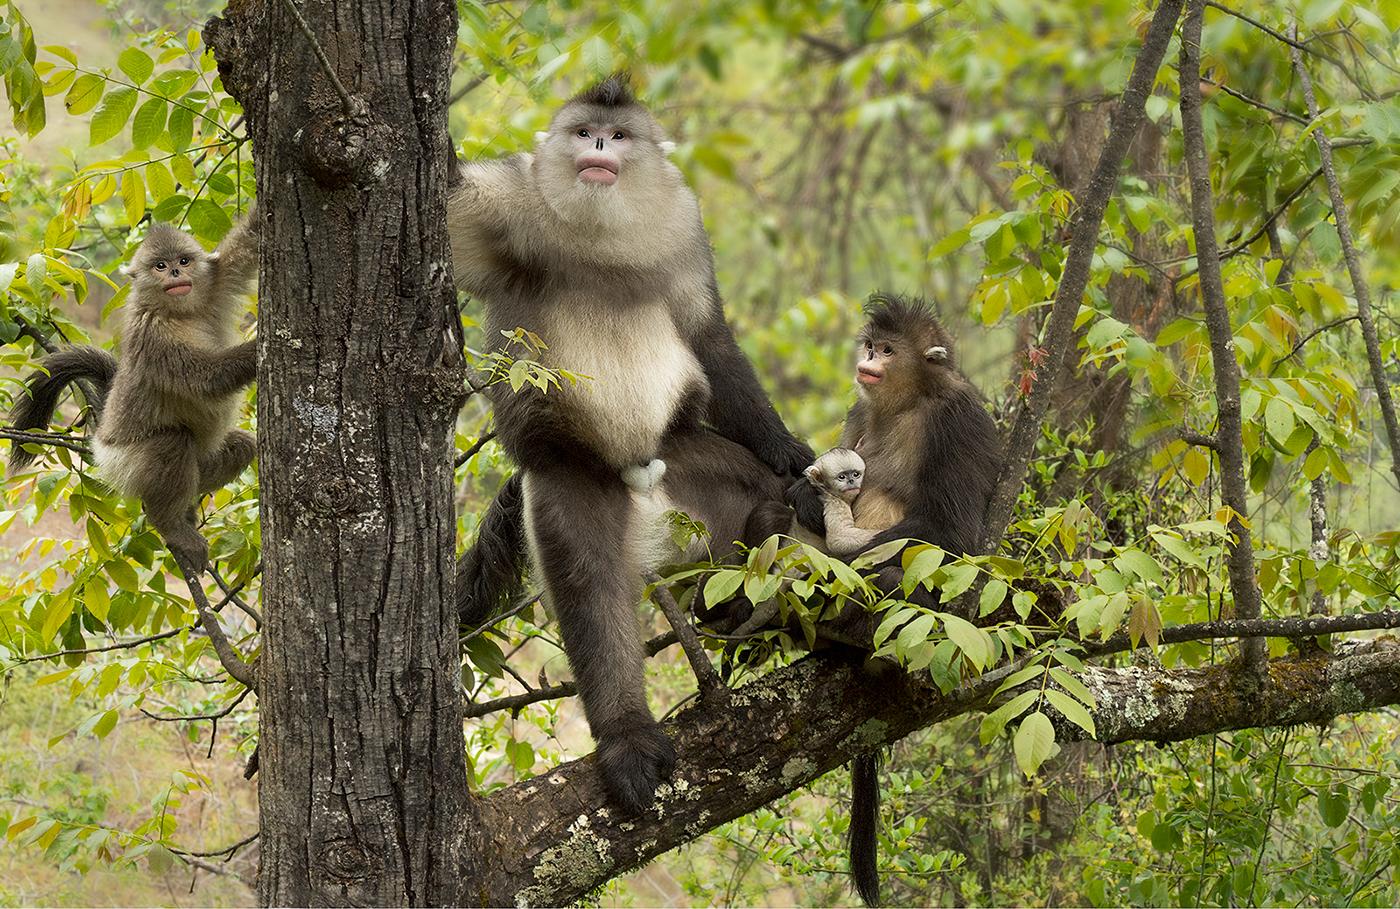 1st Place: Yunnan Black Snub Nose Monkeys (Margaret Tabner)